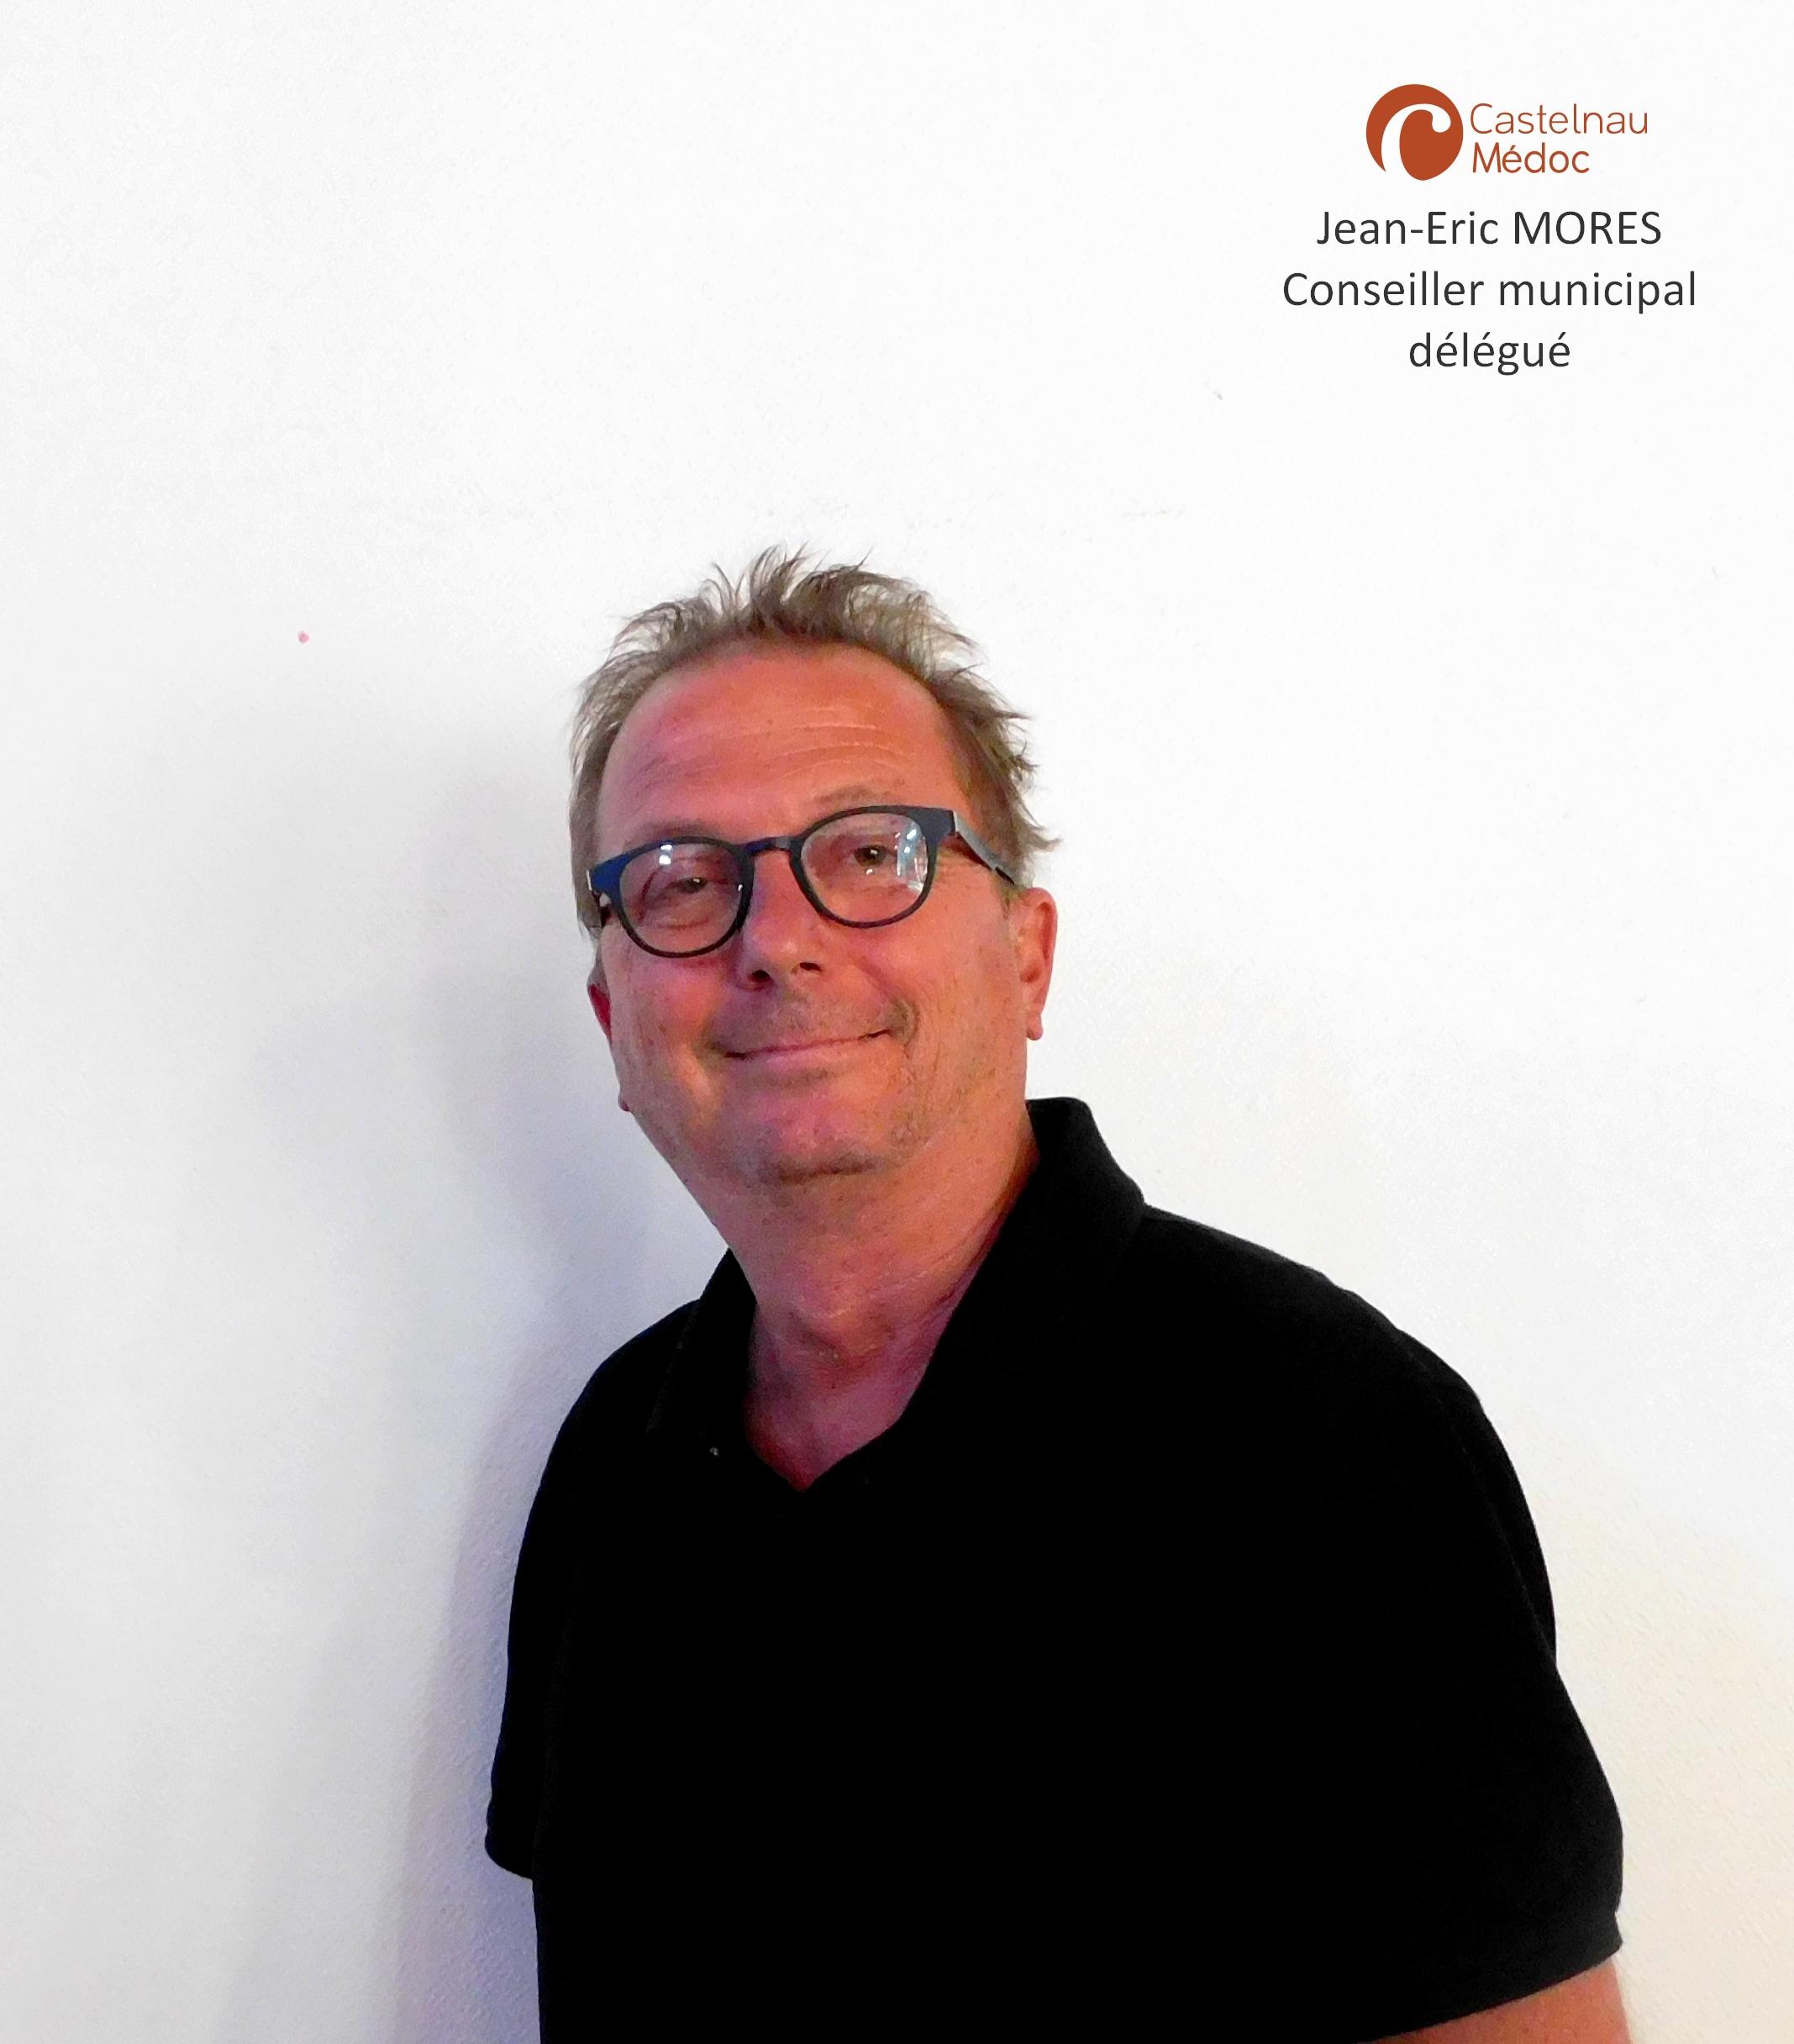 Jean-Eric MORES